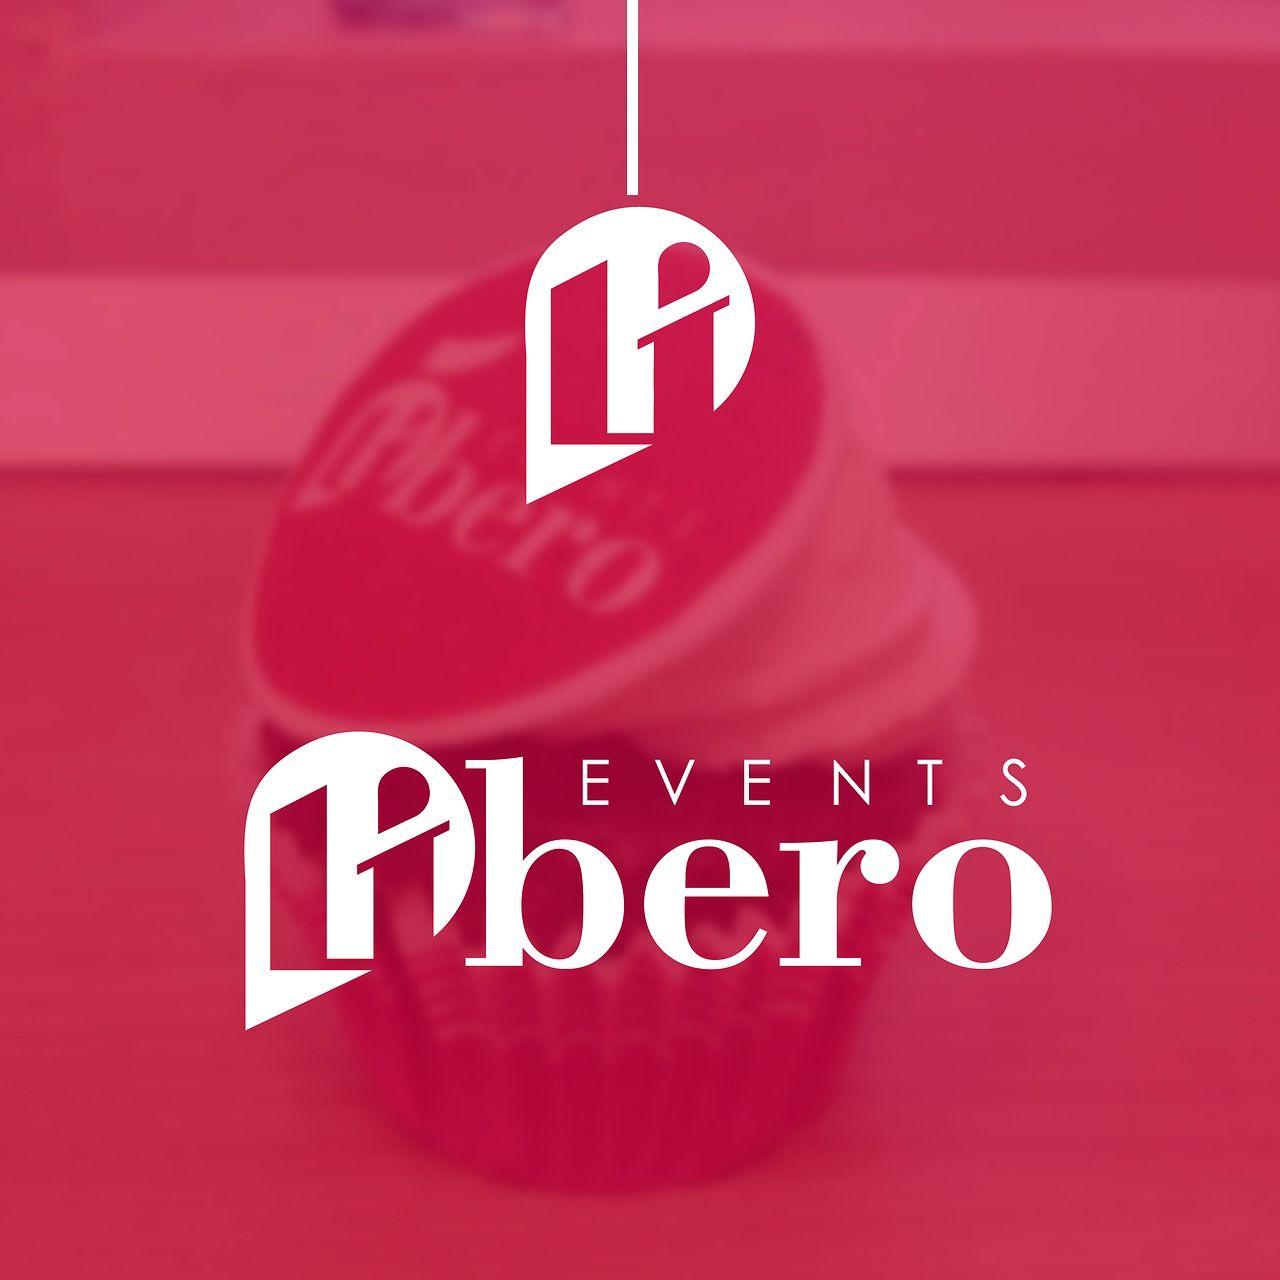 Libero Events Rebranding Branding, Identity,    @ Didi Kasa